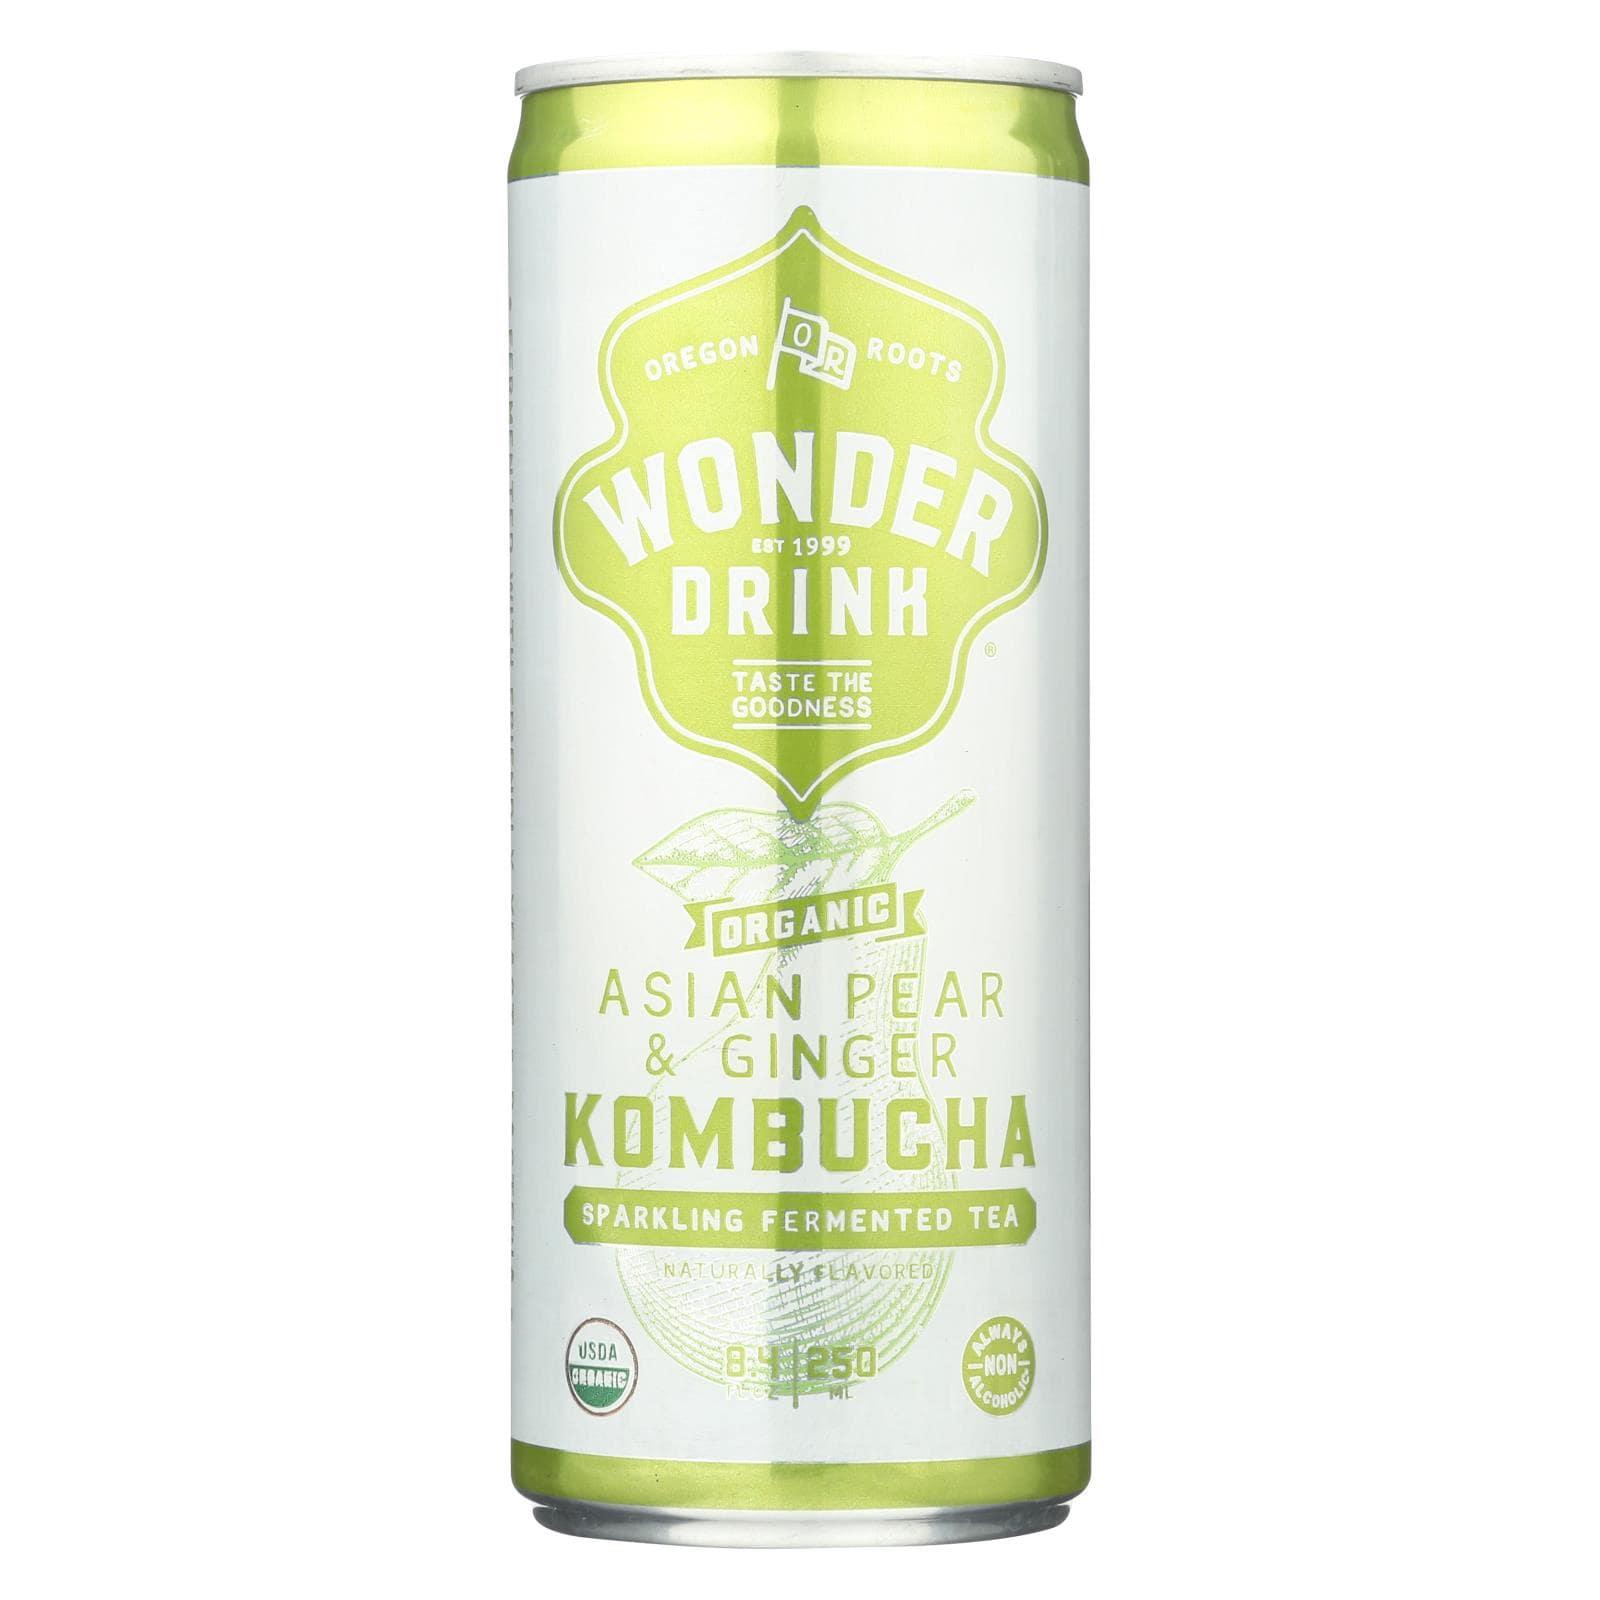 Kombucha Wonder Drink